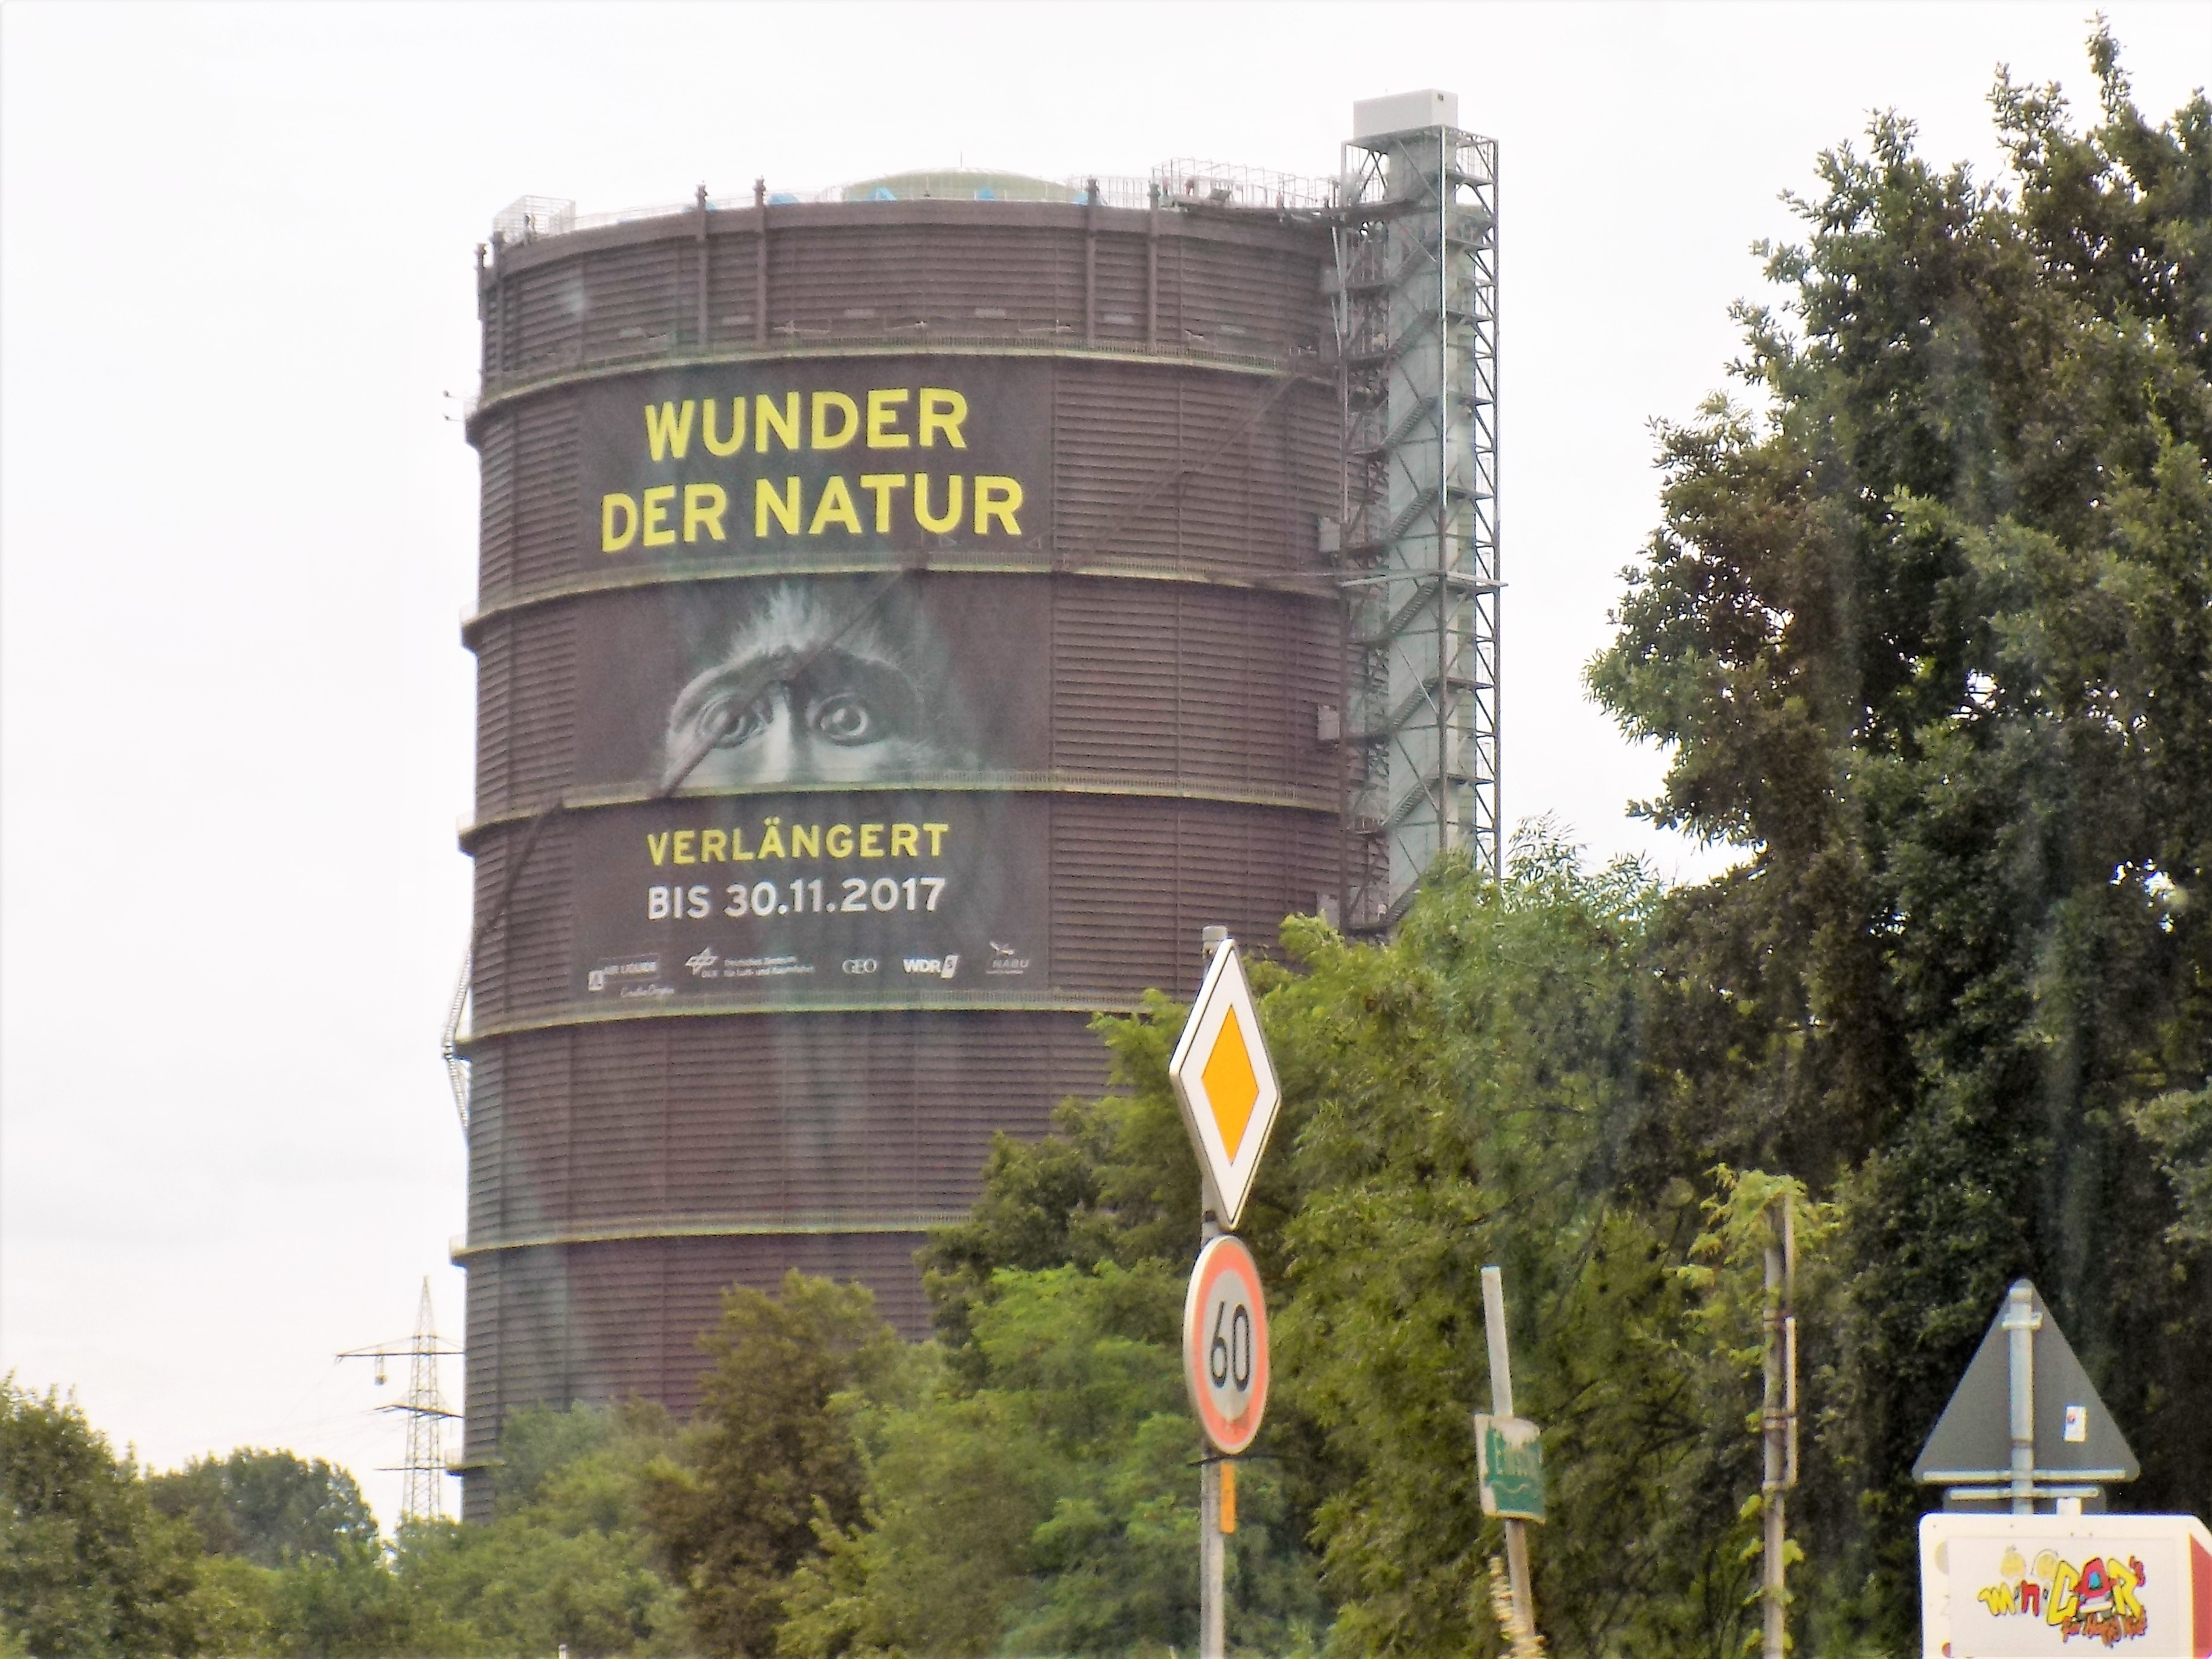 Gasometer Oberhausen: Wunder der Natur